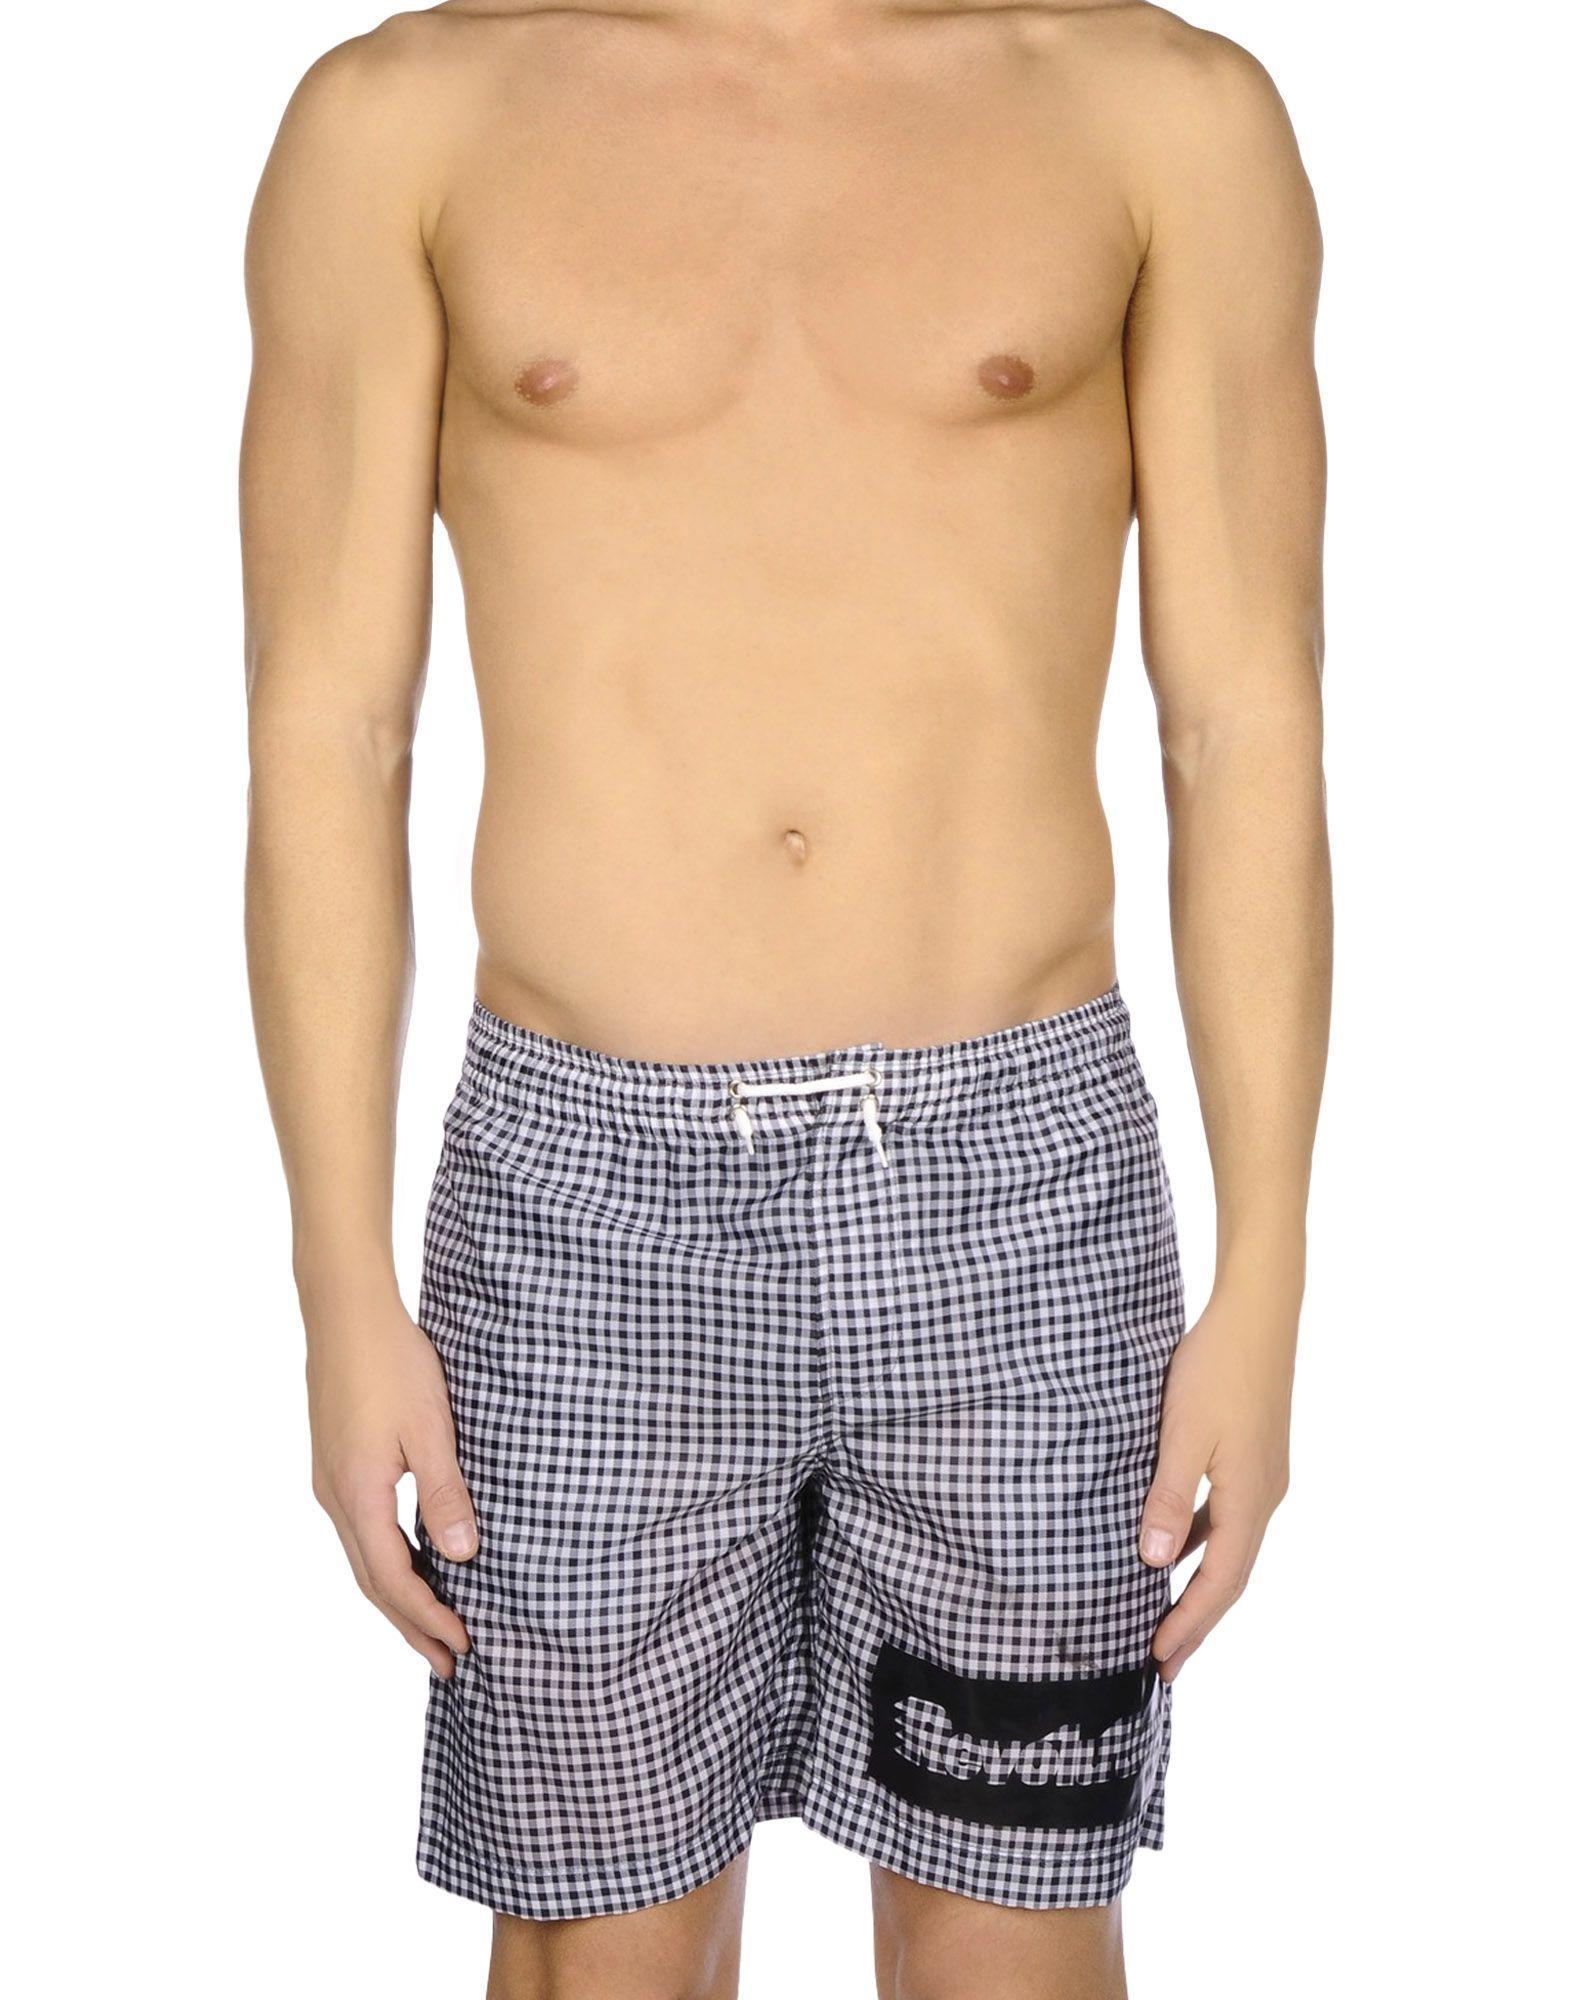 DANIELE ALESSANDRINI HOMME Пляжные брюки и шорты daniele michetti daniele michetti ботильоны женские 132